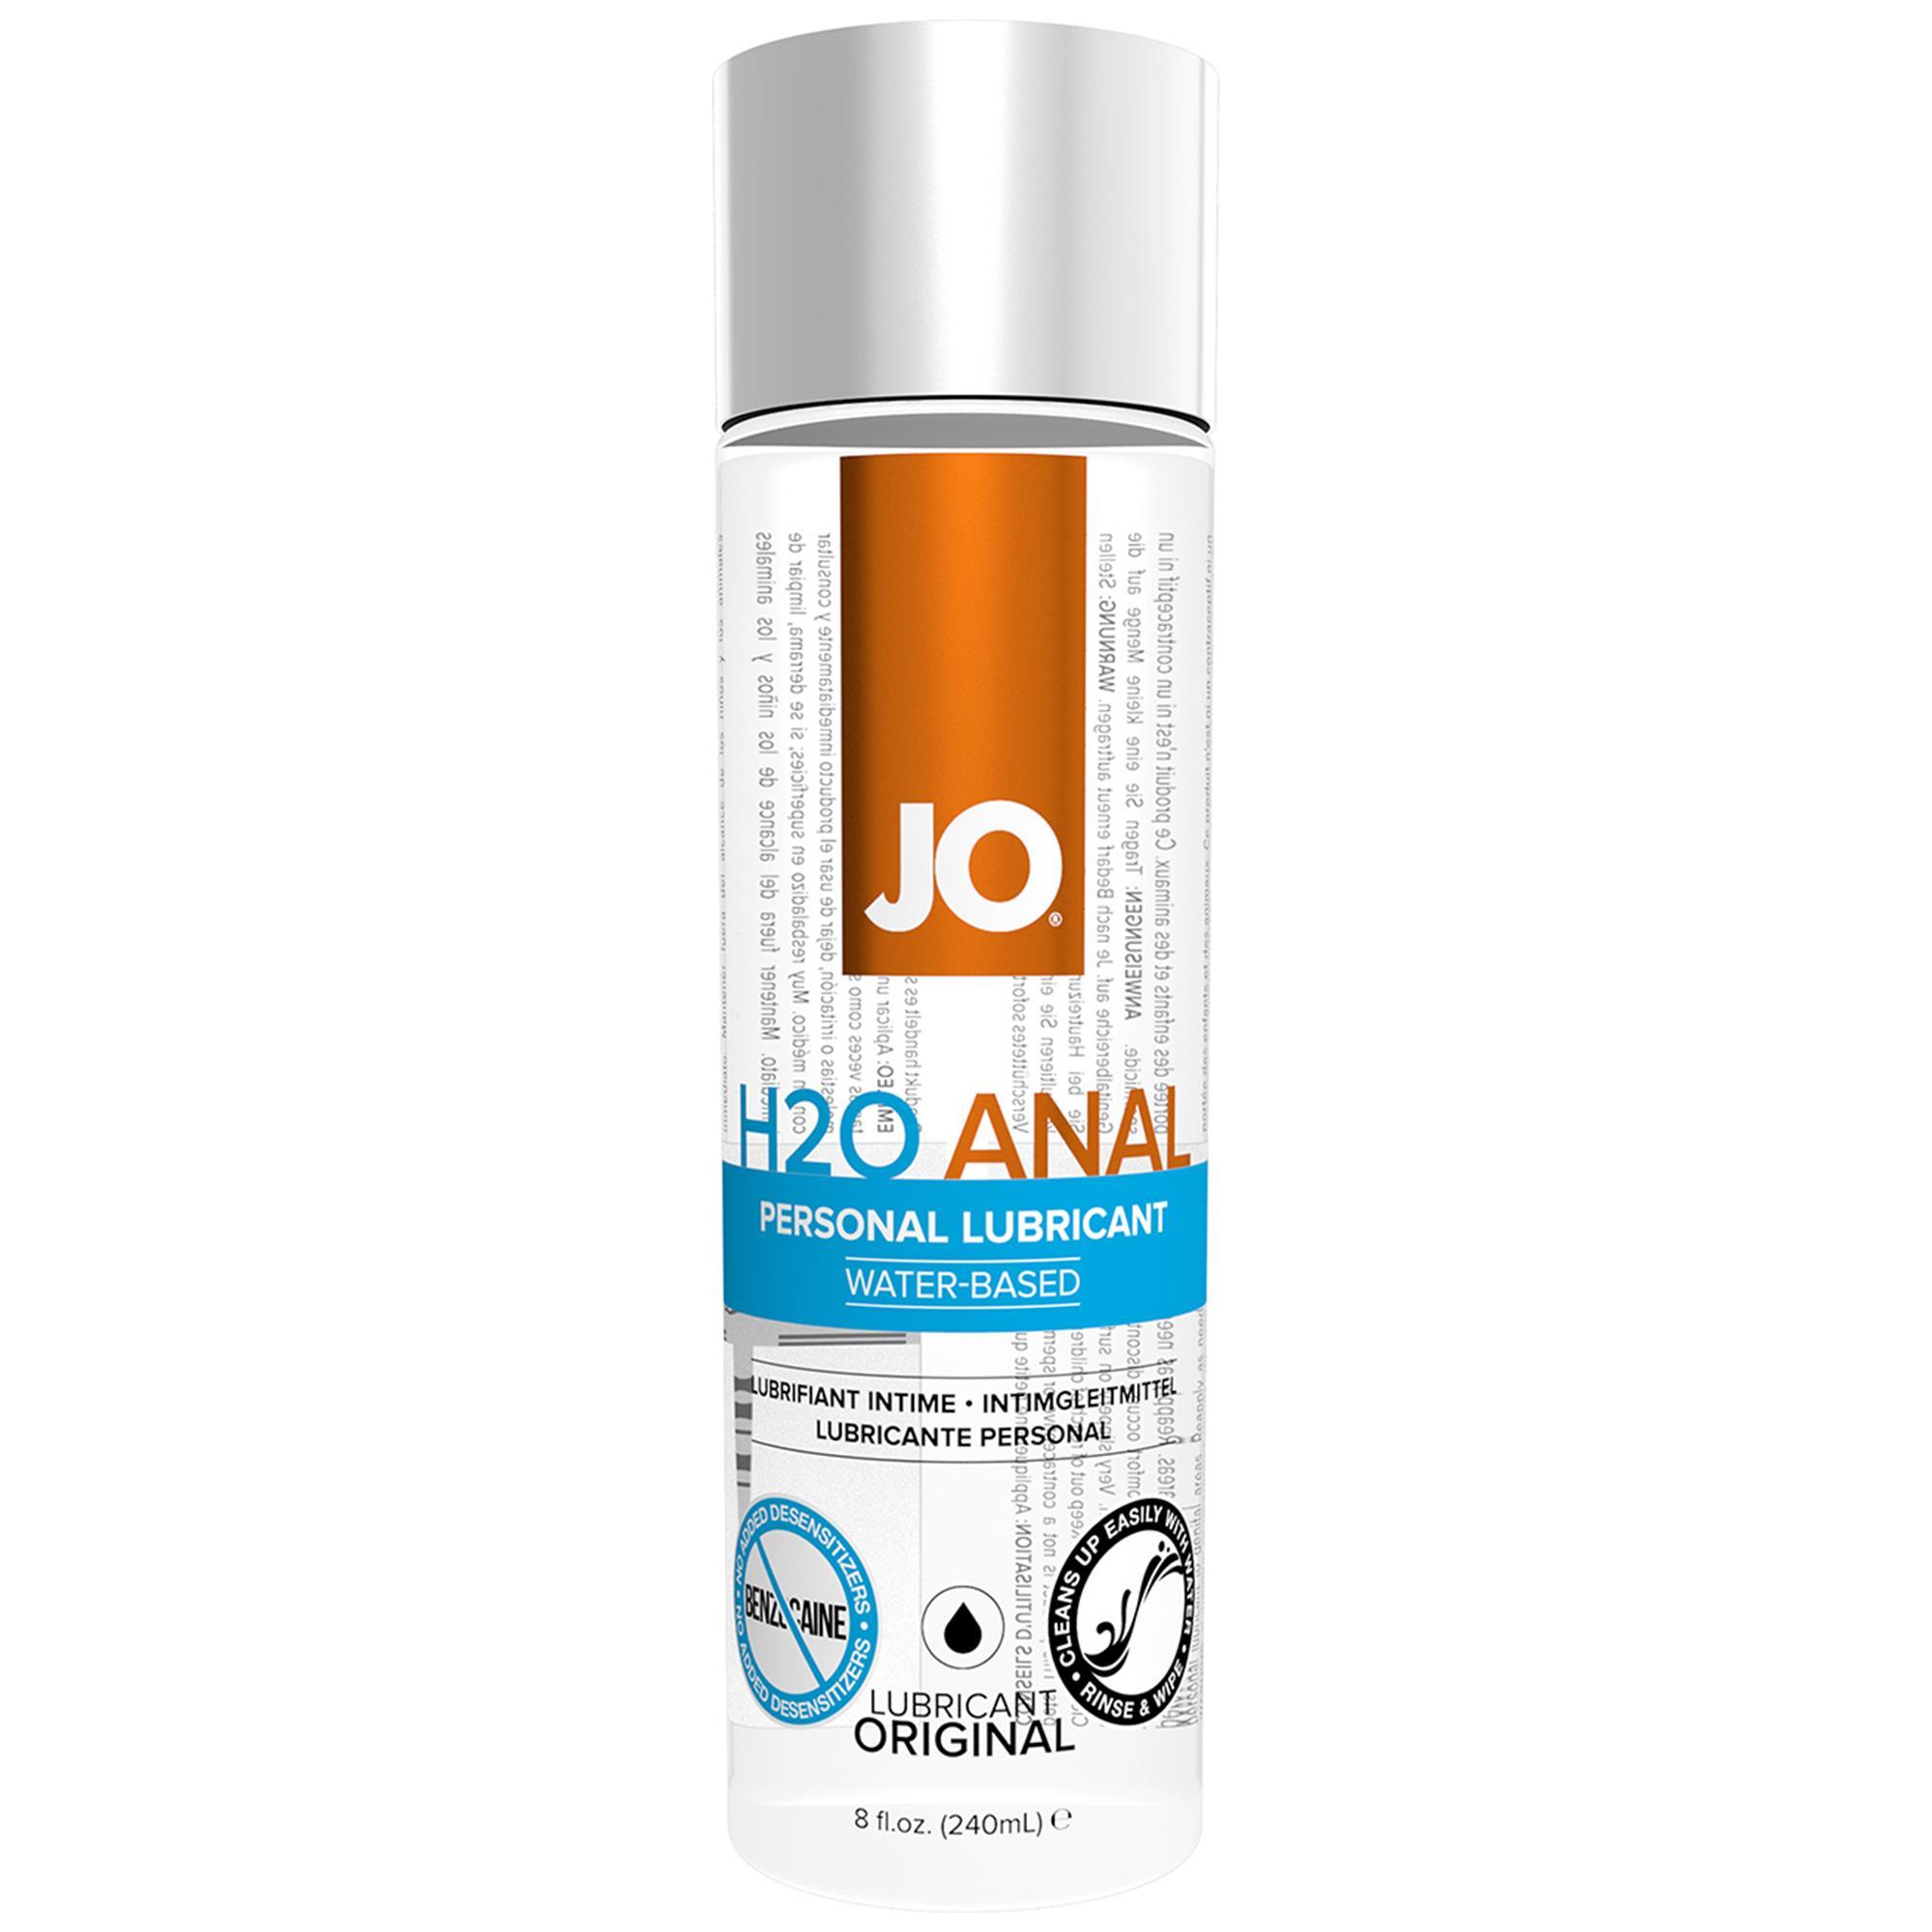 JO Anal H2O - 240 ml   Apotek, Glidmedel, Analglidmedel   Intimast.se - Sexleksaker